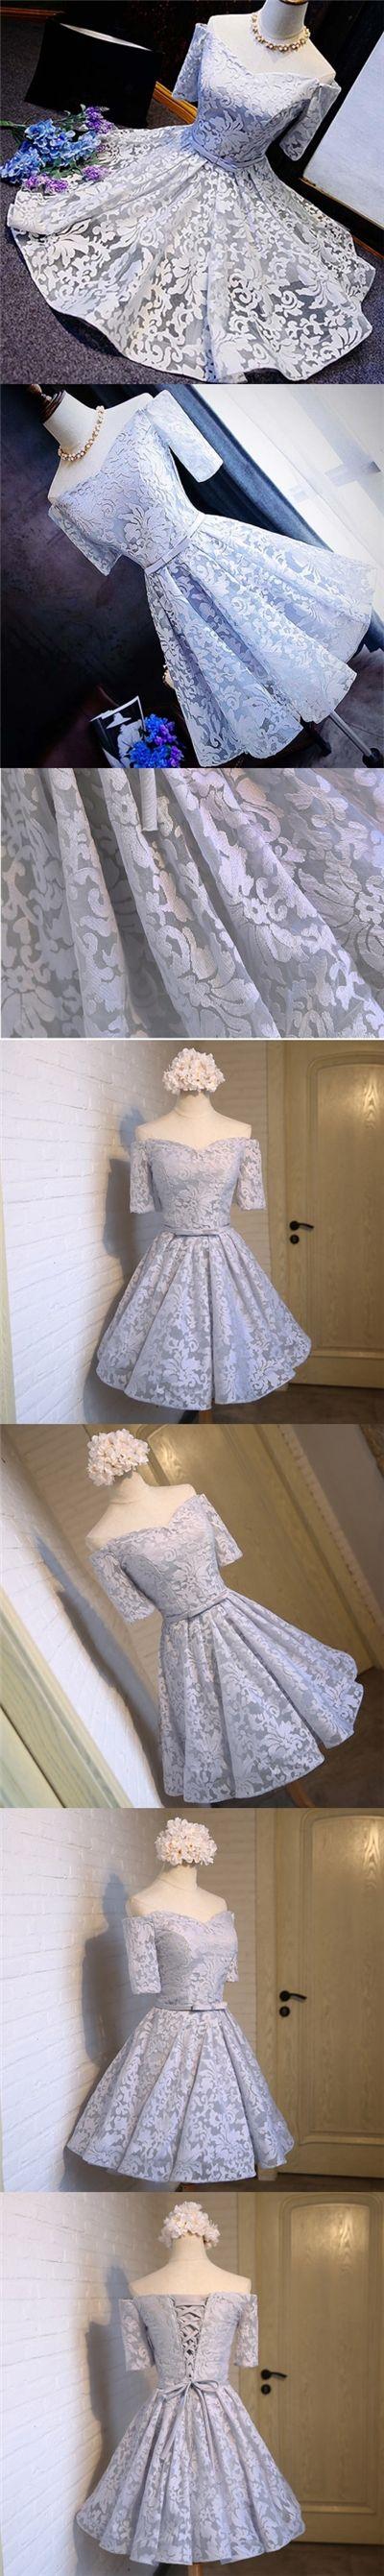 2017 Homecoming Dress Lace Off-the-shoulder Short Prom Dress Party Dress JK098